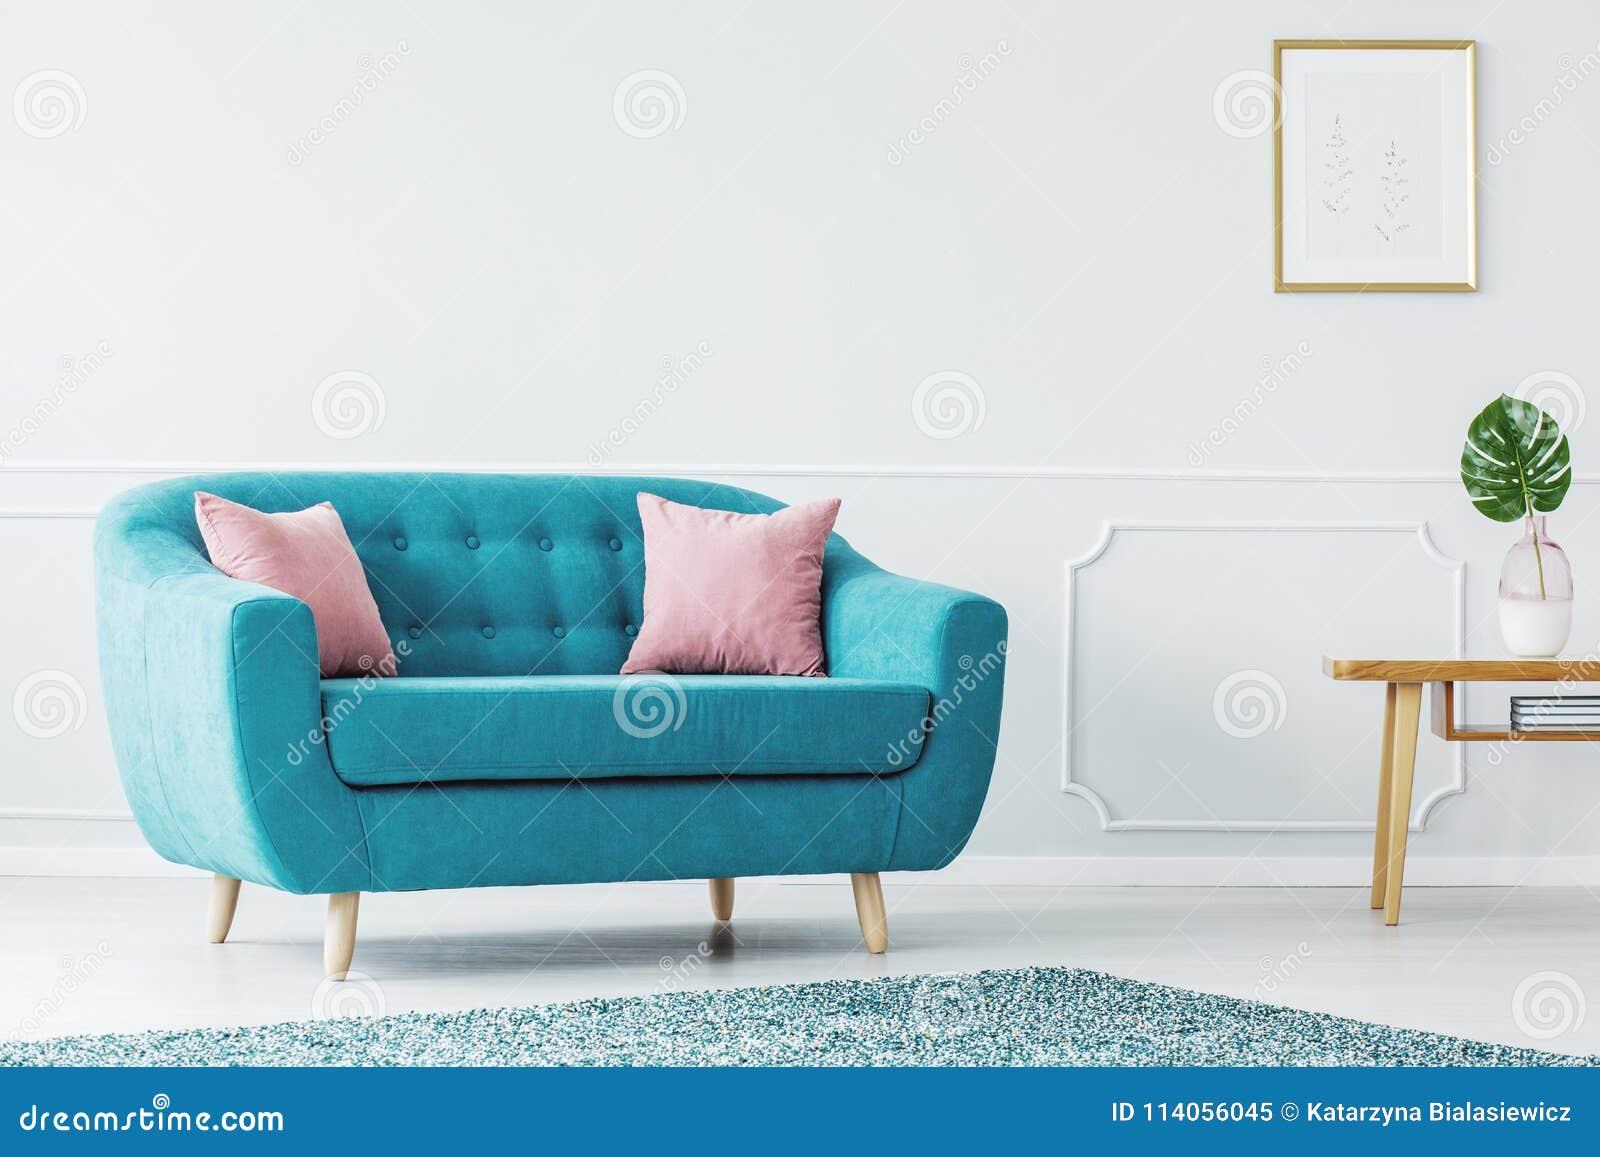 Turquoise Sofa In Minimalist Interior Stock Image - Image of ...